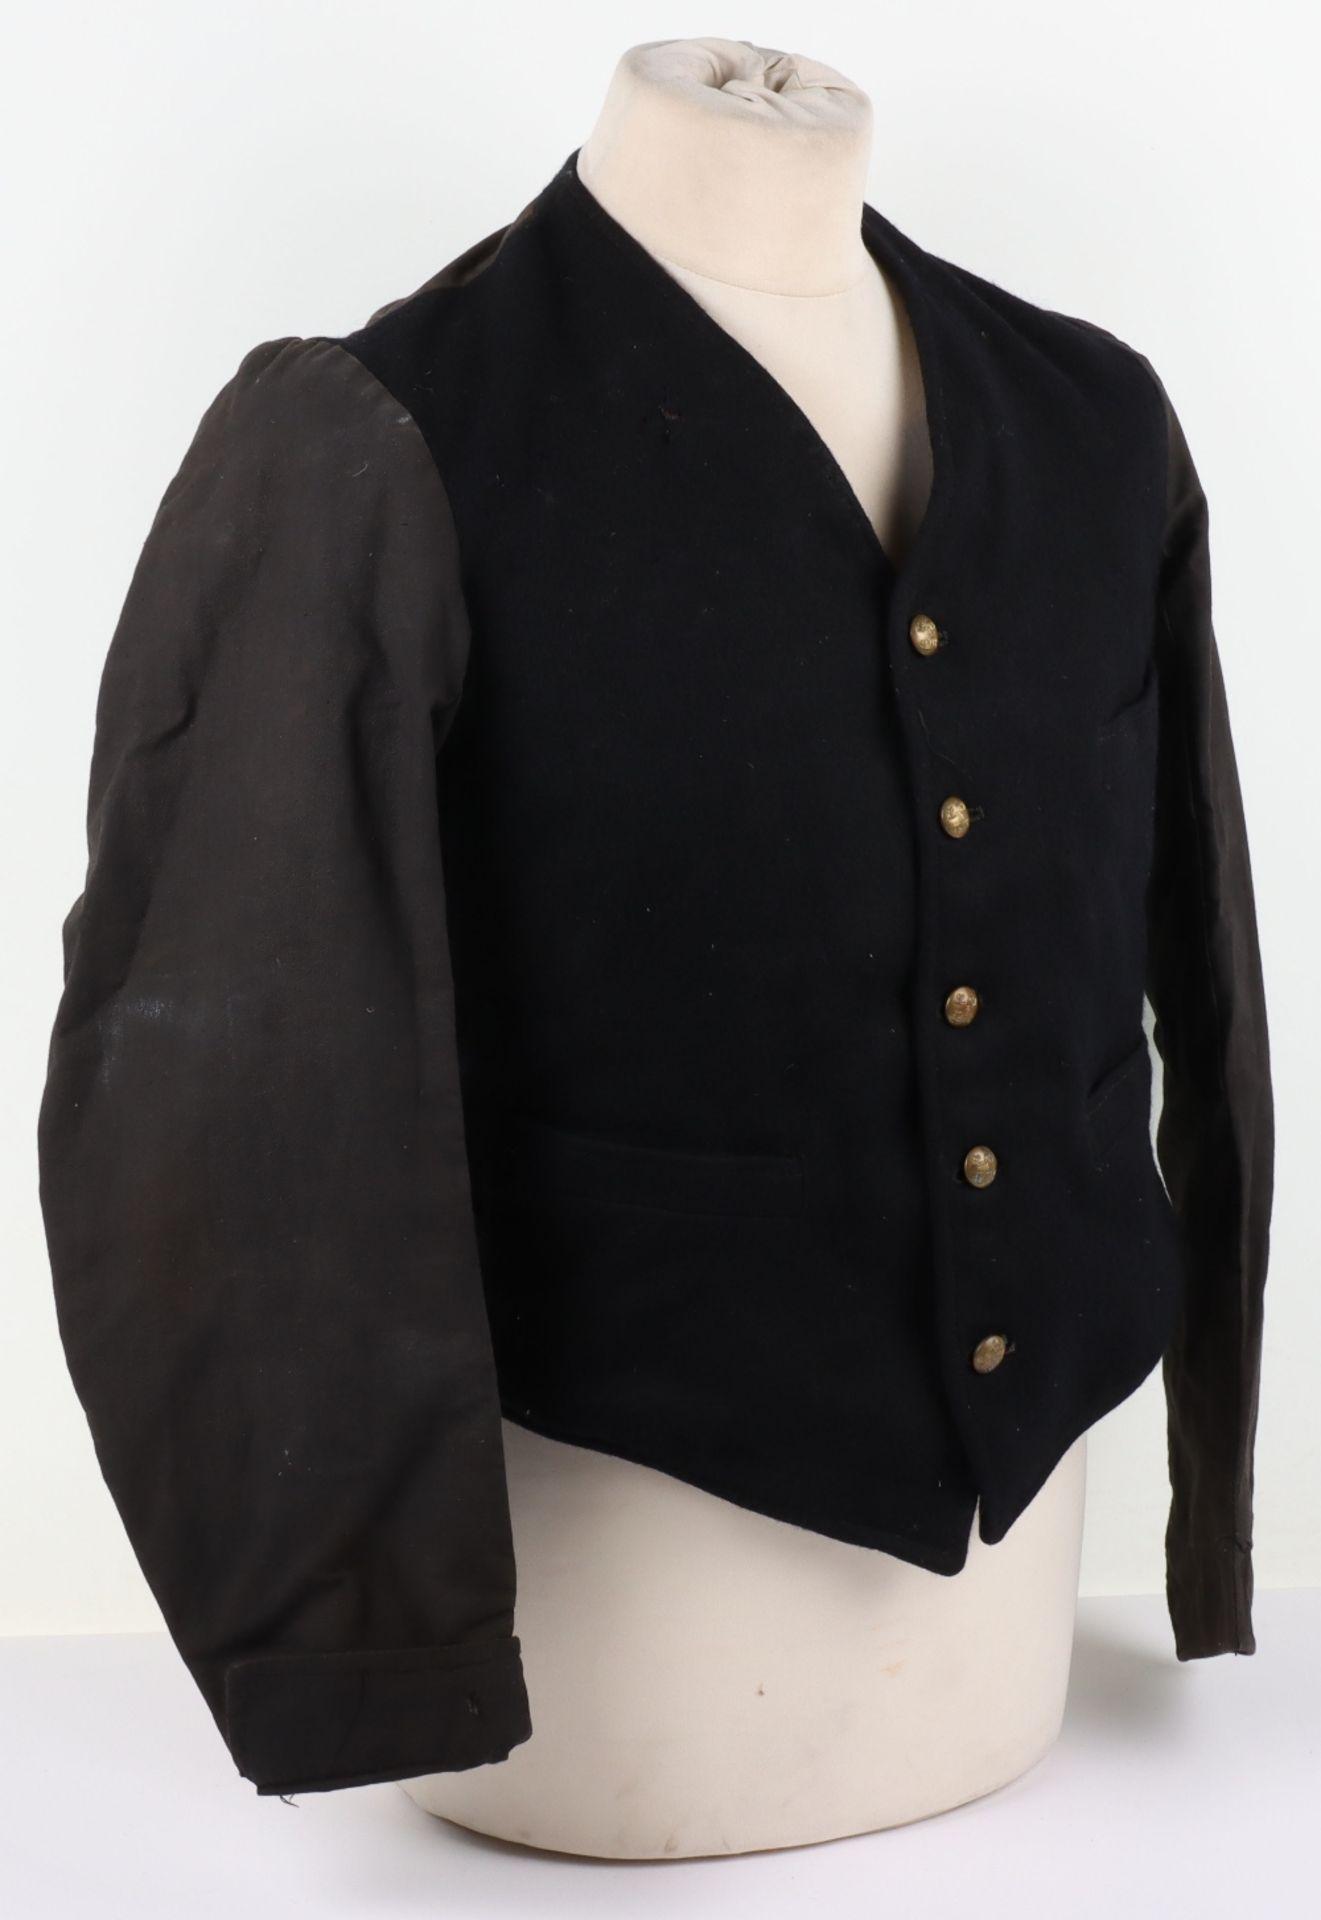 A London, Midland & Scottish and London North Eastern Railway porter's jacket, circa 1930 - Image 4 of 13